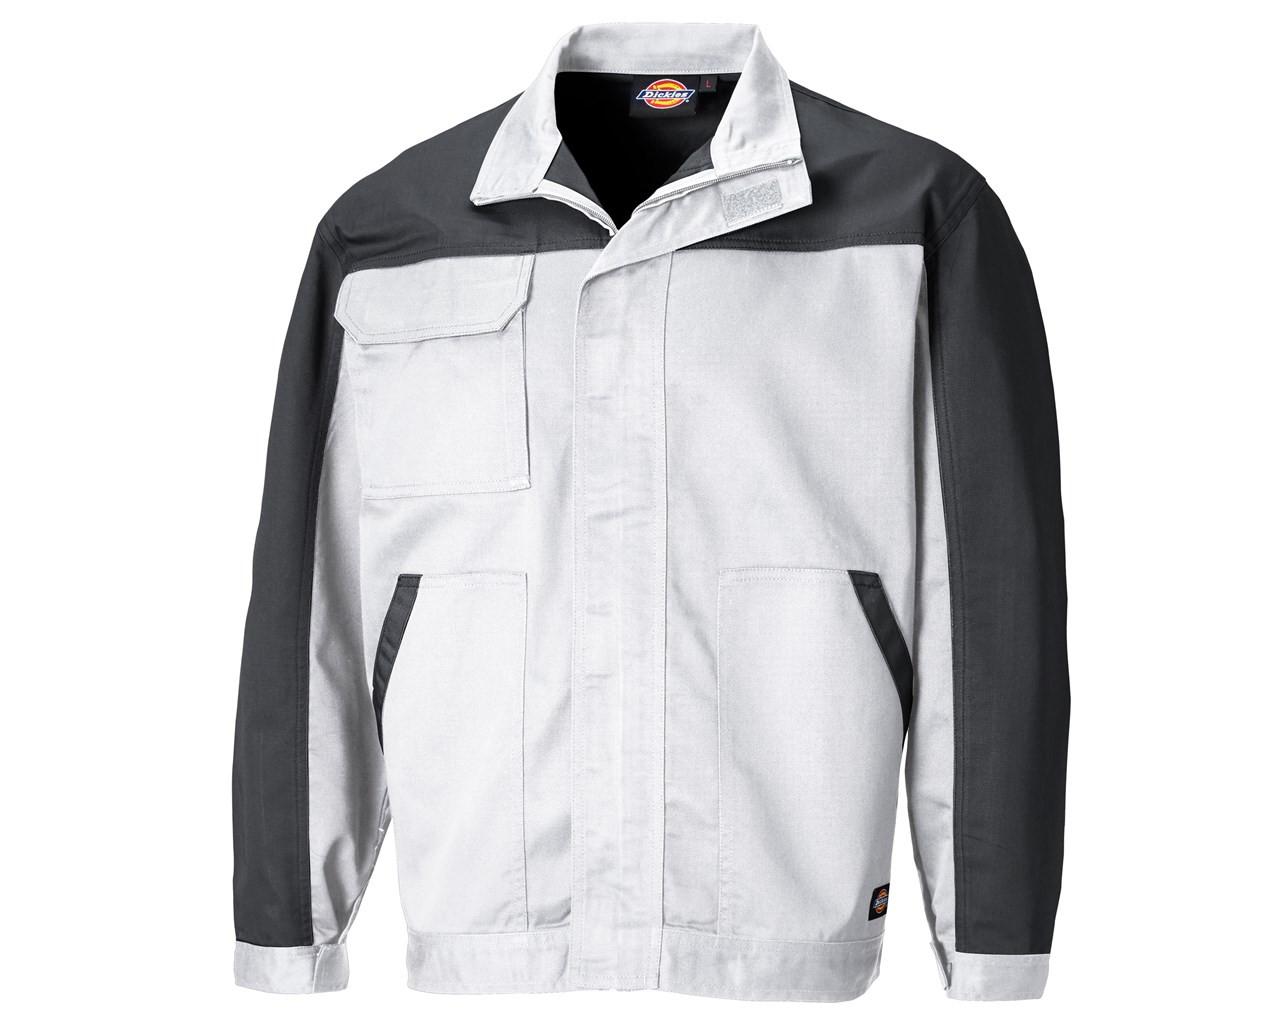 Dickies Everyday Jacket - White/Grey - Medium